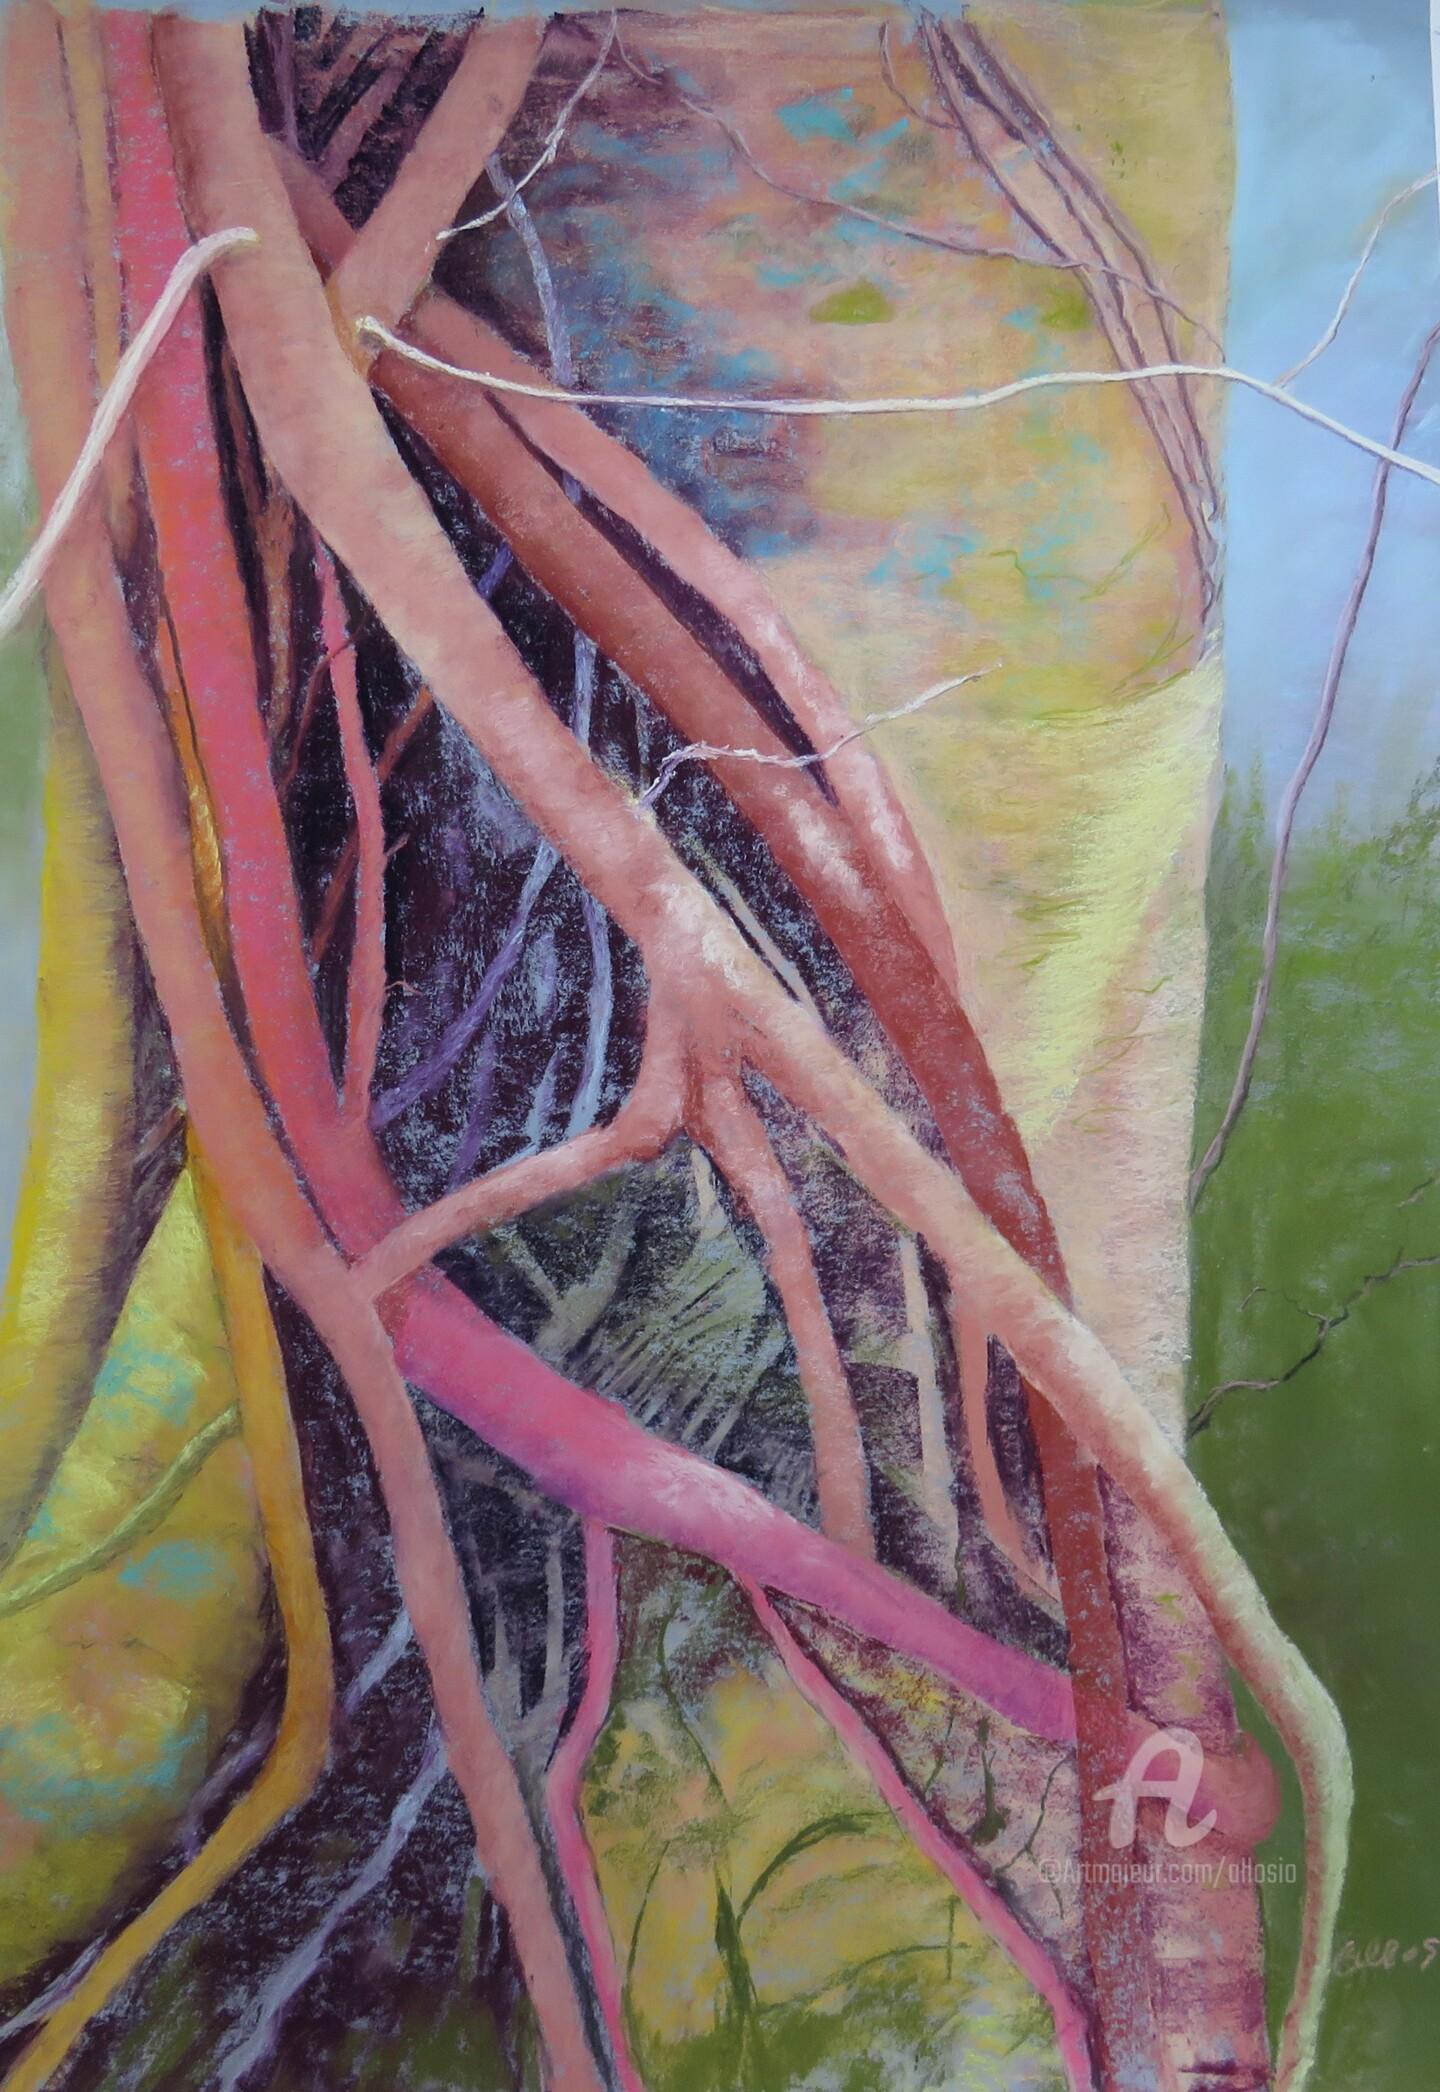 Claudette Allosio - Mon arbre connecté